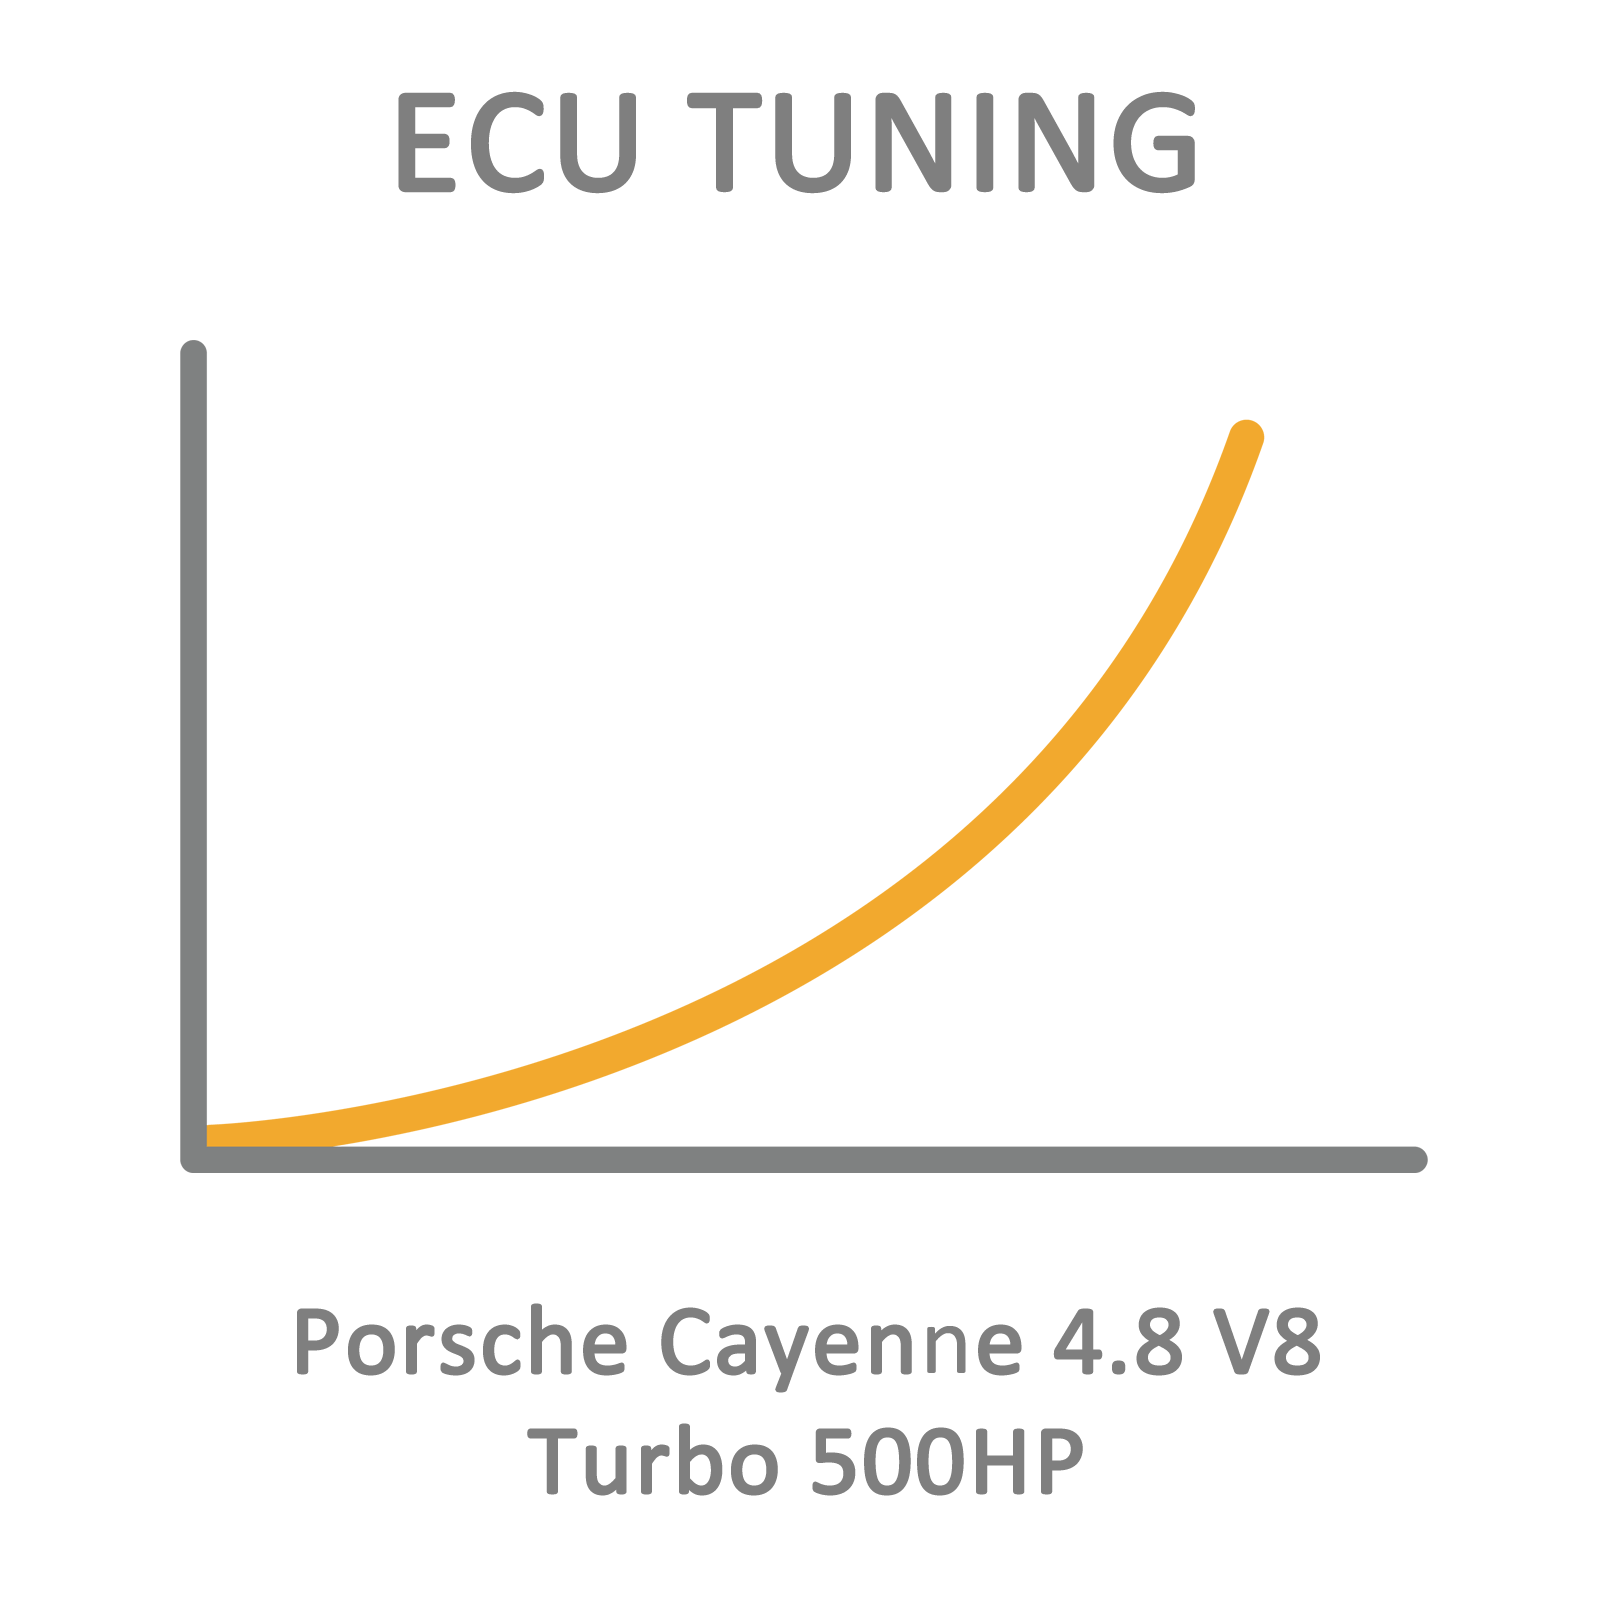 Porsche Cayenne 4.8 V8 Turbo 500HP ECU Tuning Remapping